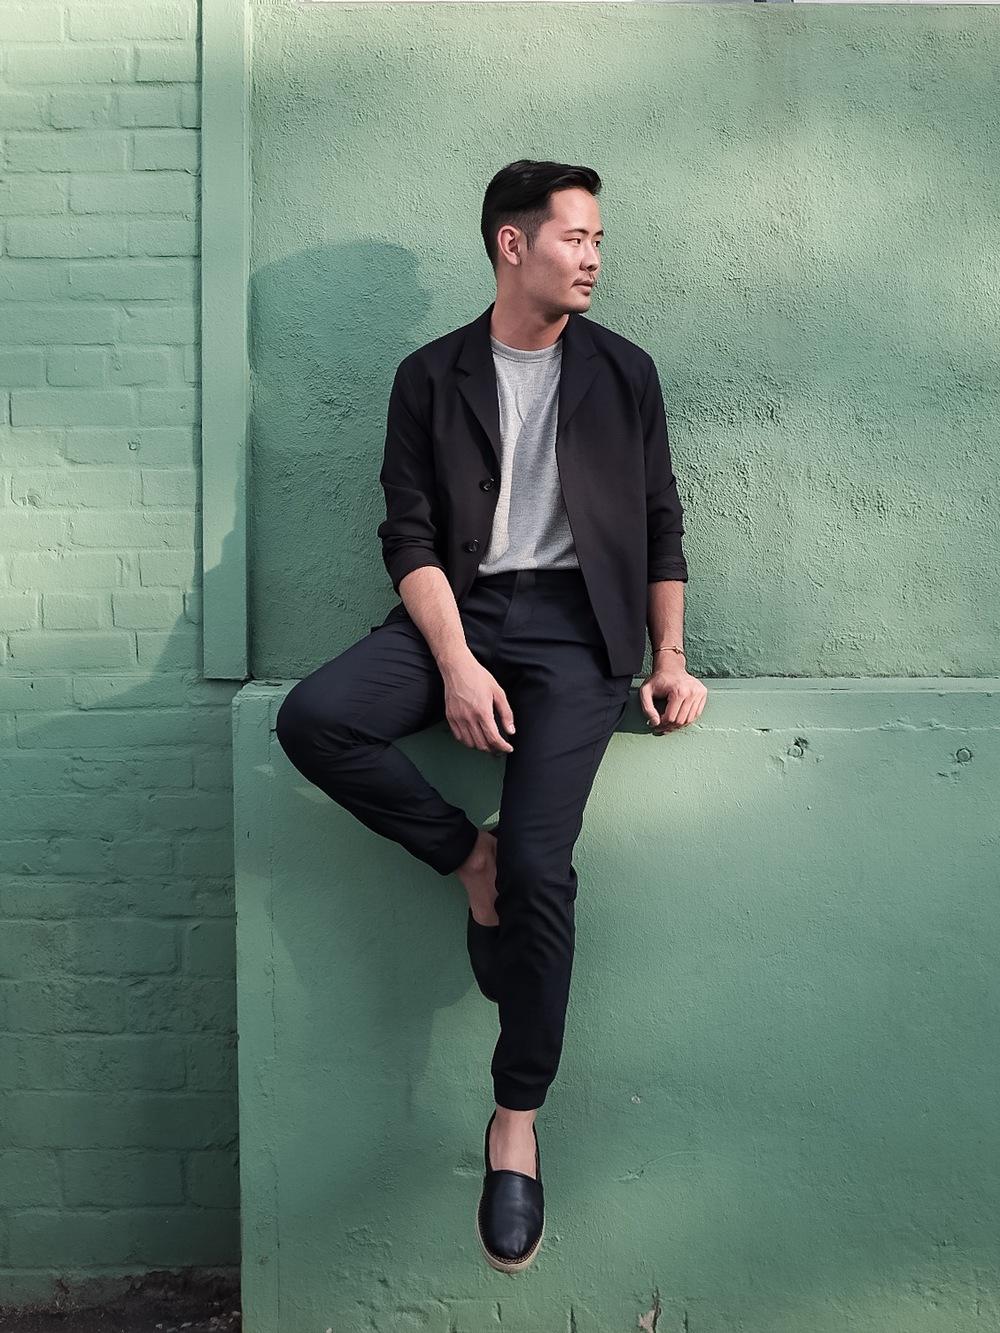 Jacket: COS, teeshirt: Theory, pants: Kit & Ace, shoes: MSGM, bracelet: Celine